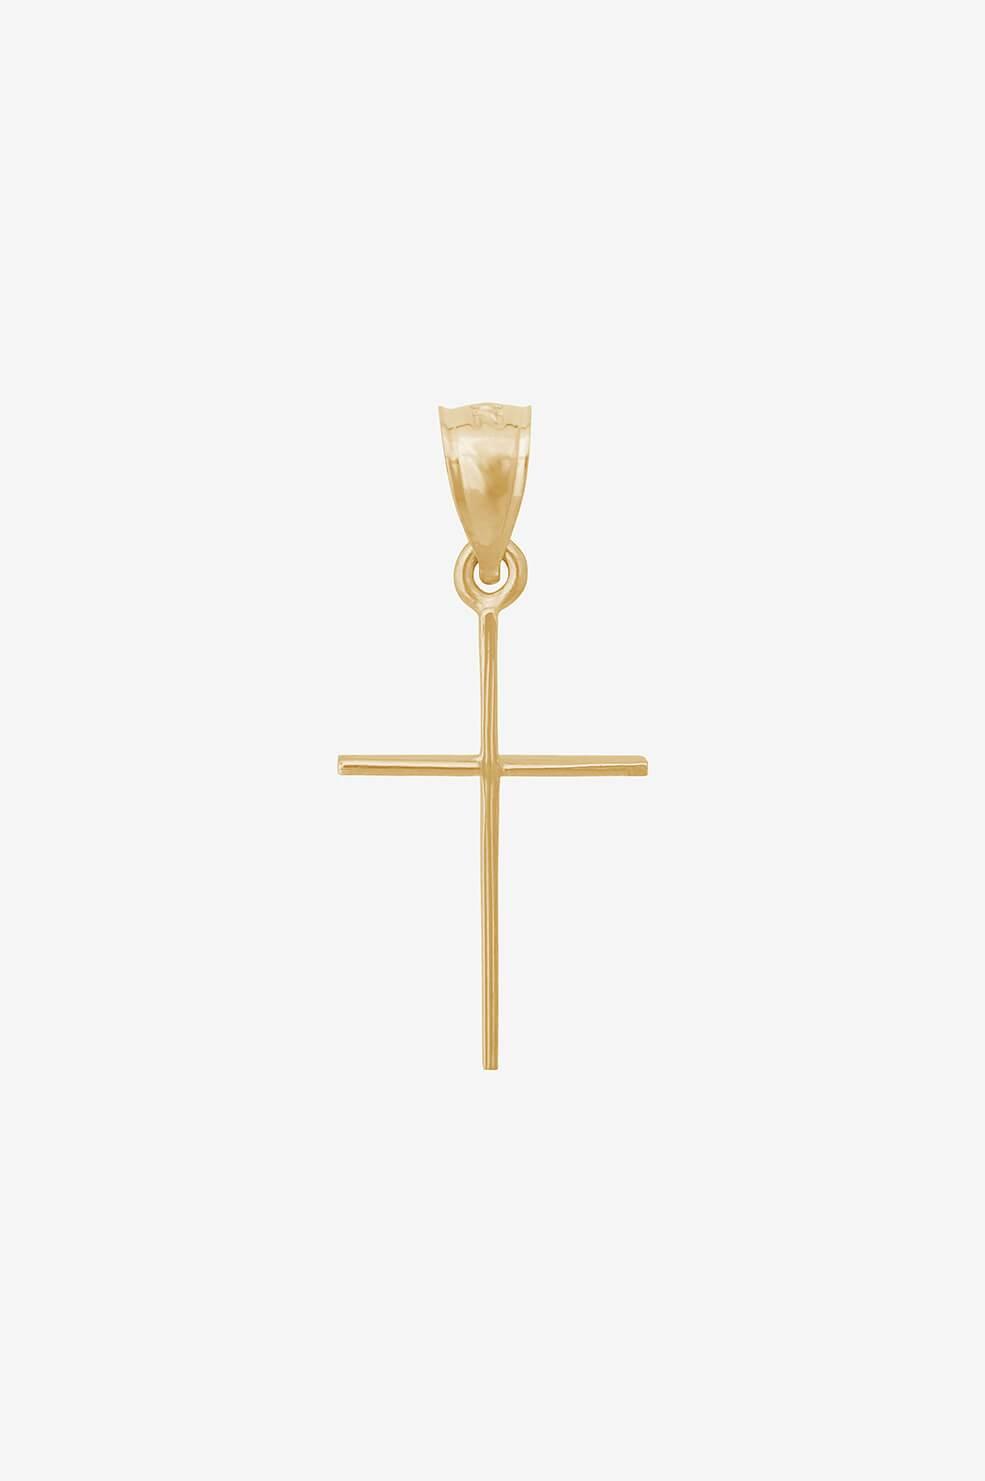 Cross Charm Cross Charms Gold Cross Charm Charm Pendant